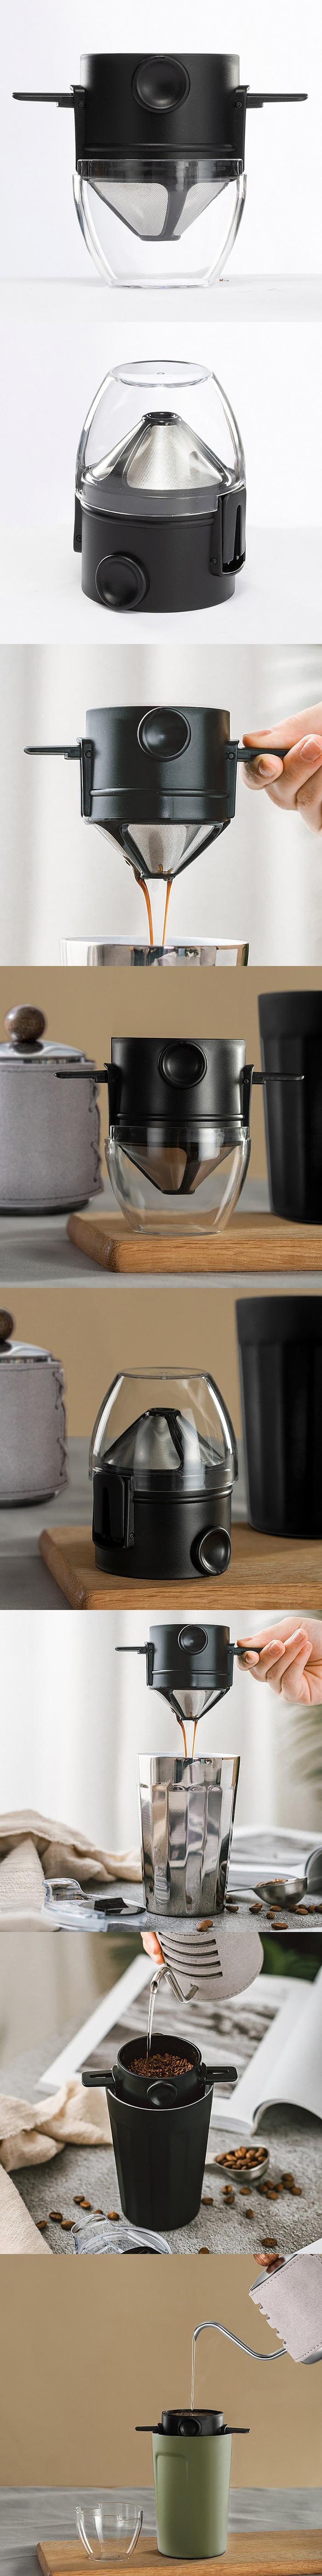 PO:Selected 丹麥棱角保溫杯咖啡三件組(棱角保溫杯-黑/咖啡磨2.0/咖啡濾網)